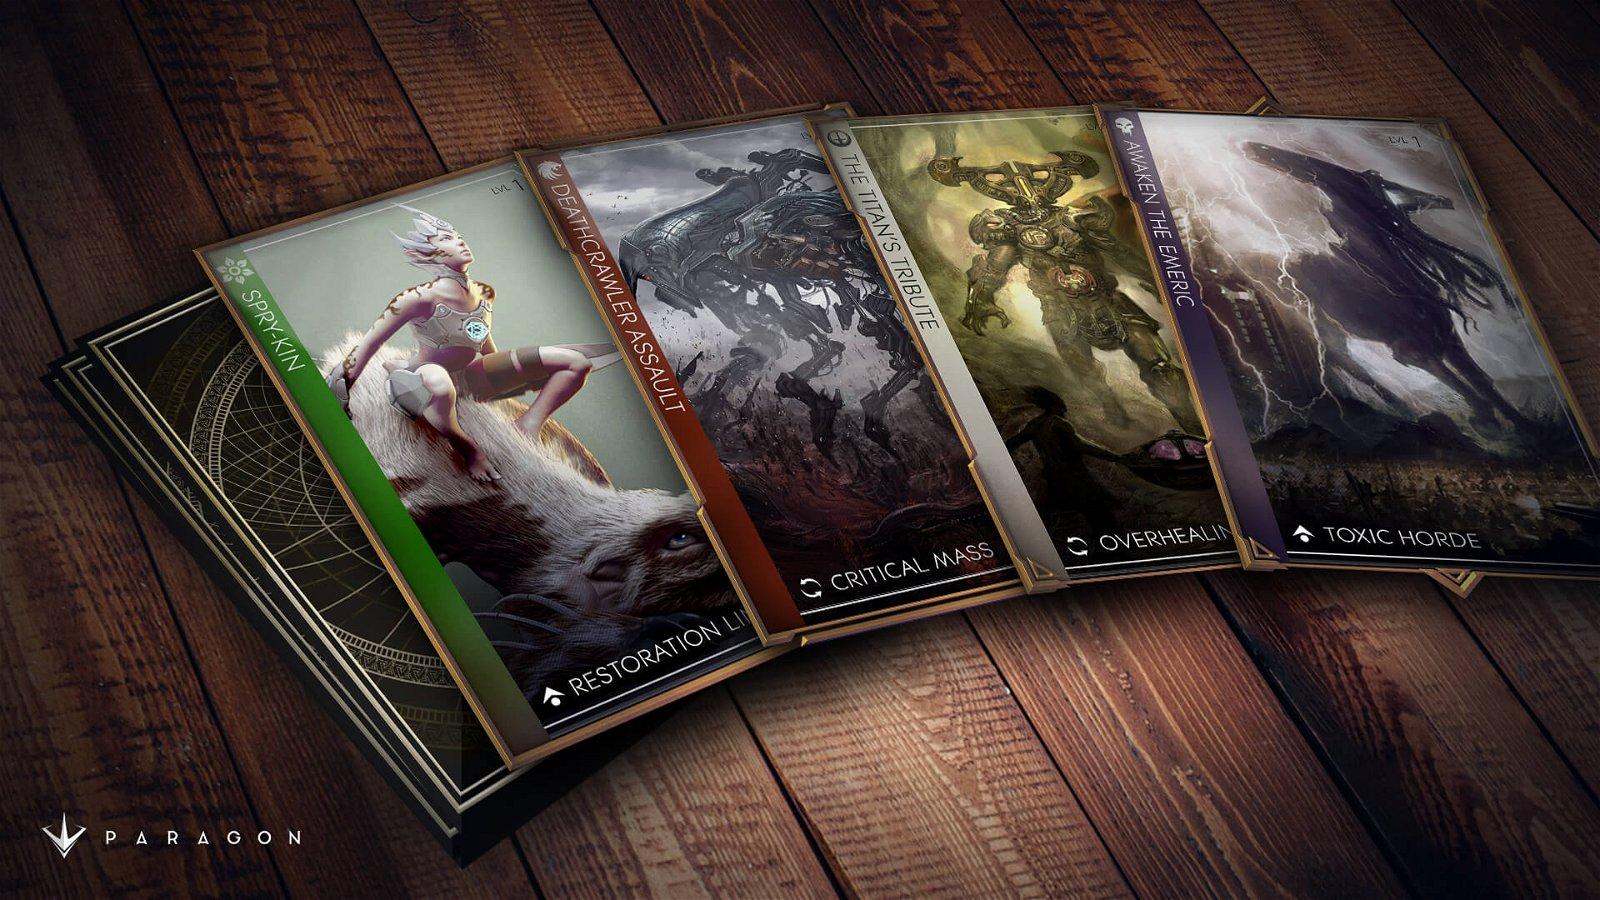 Epic Games Announces Huge Paragon Update 1